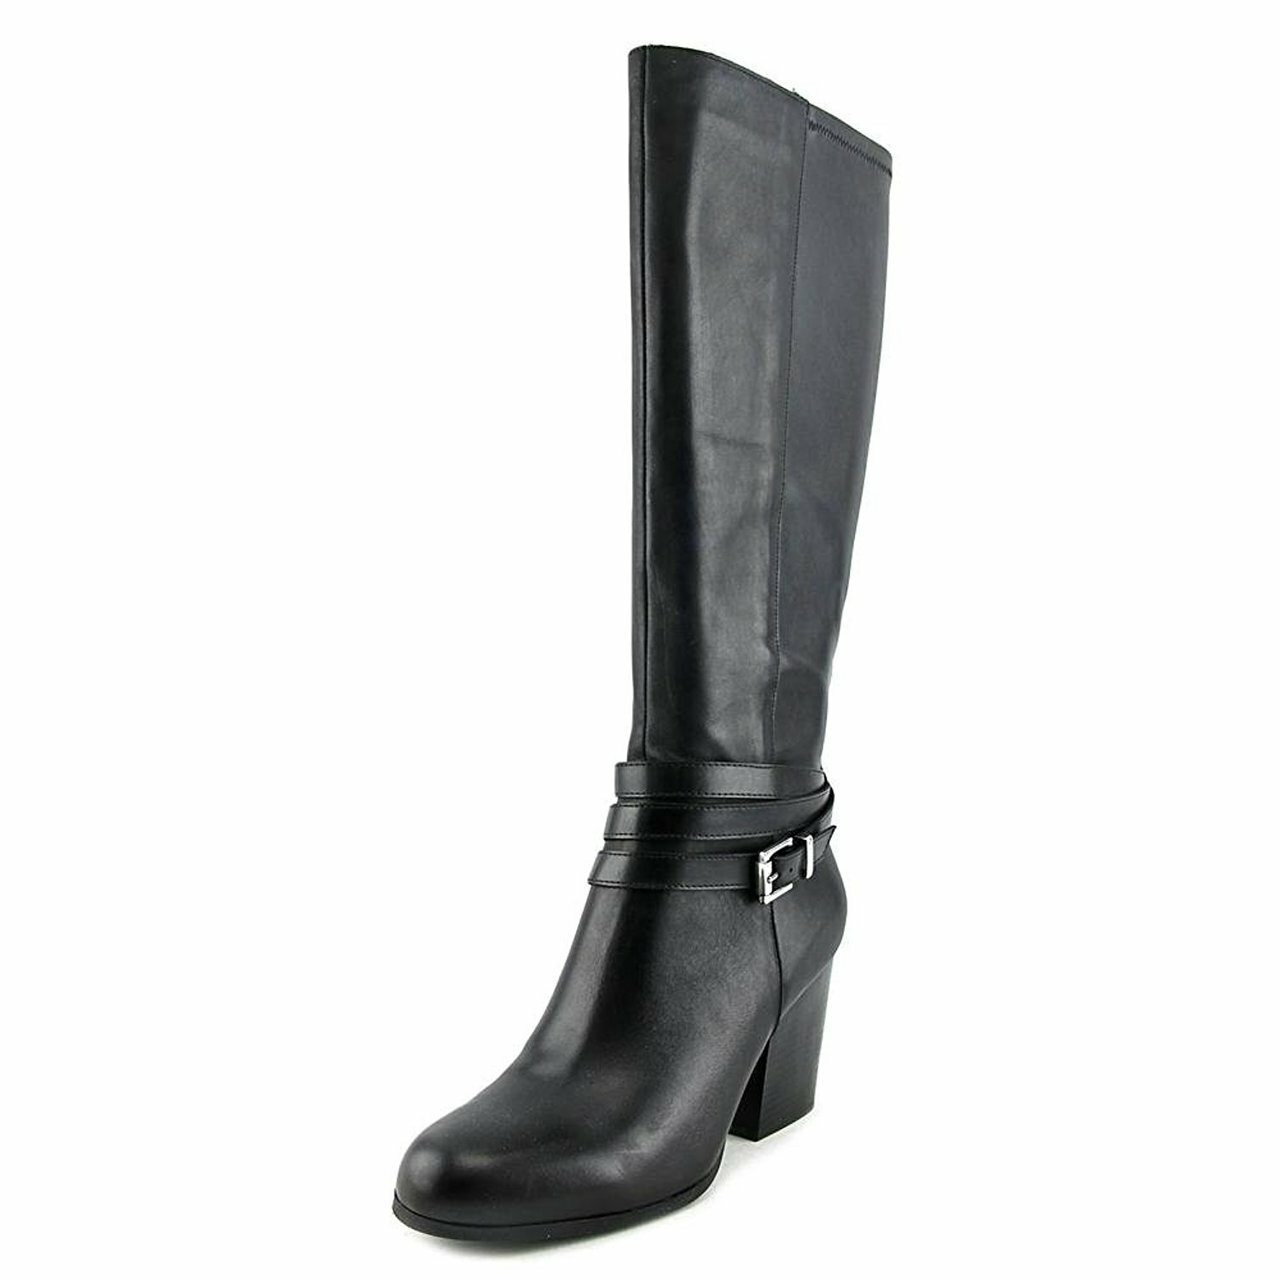 f5d3b123e8ef3 Bar III Womens Paisley Closed Toe Knee High Fashion Boots~pp-5efa82dc